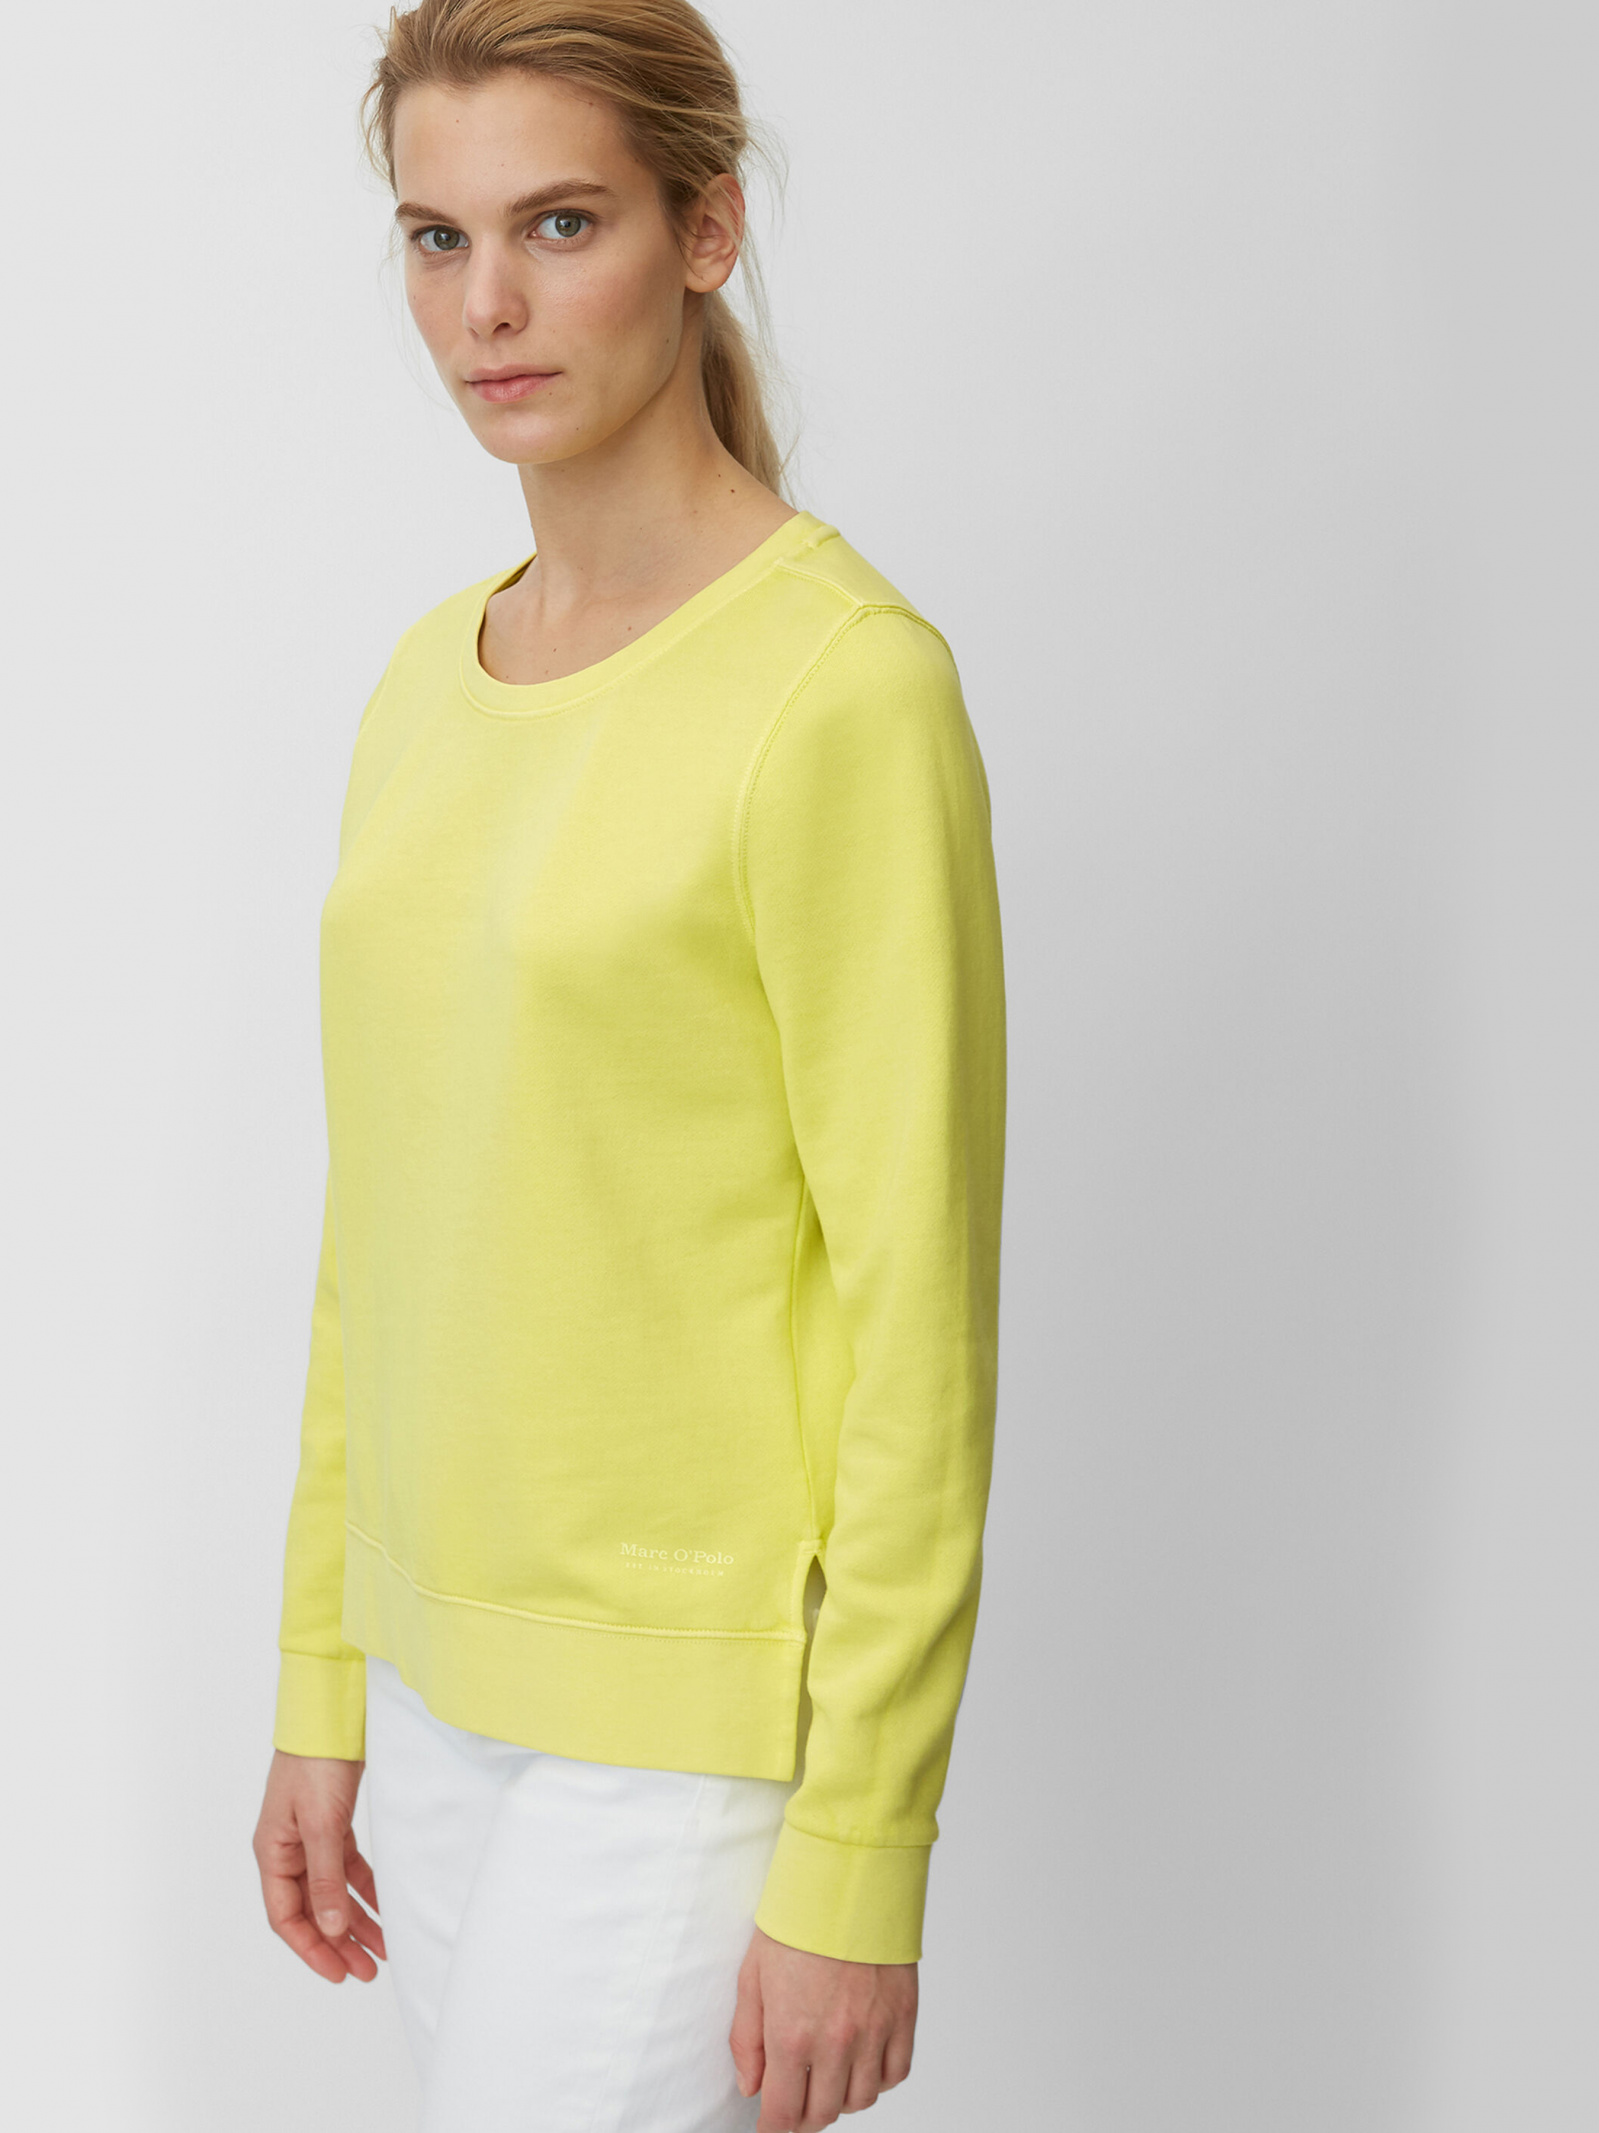 Кофты и свитера женские MARC O'POLO модель PF4007 характеристики, 2017